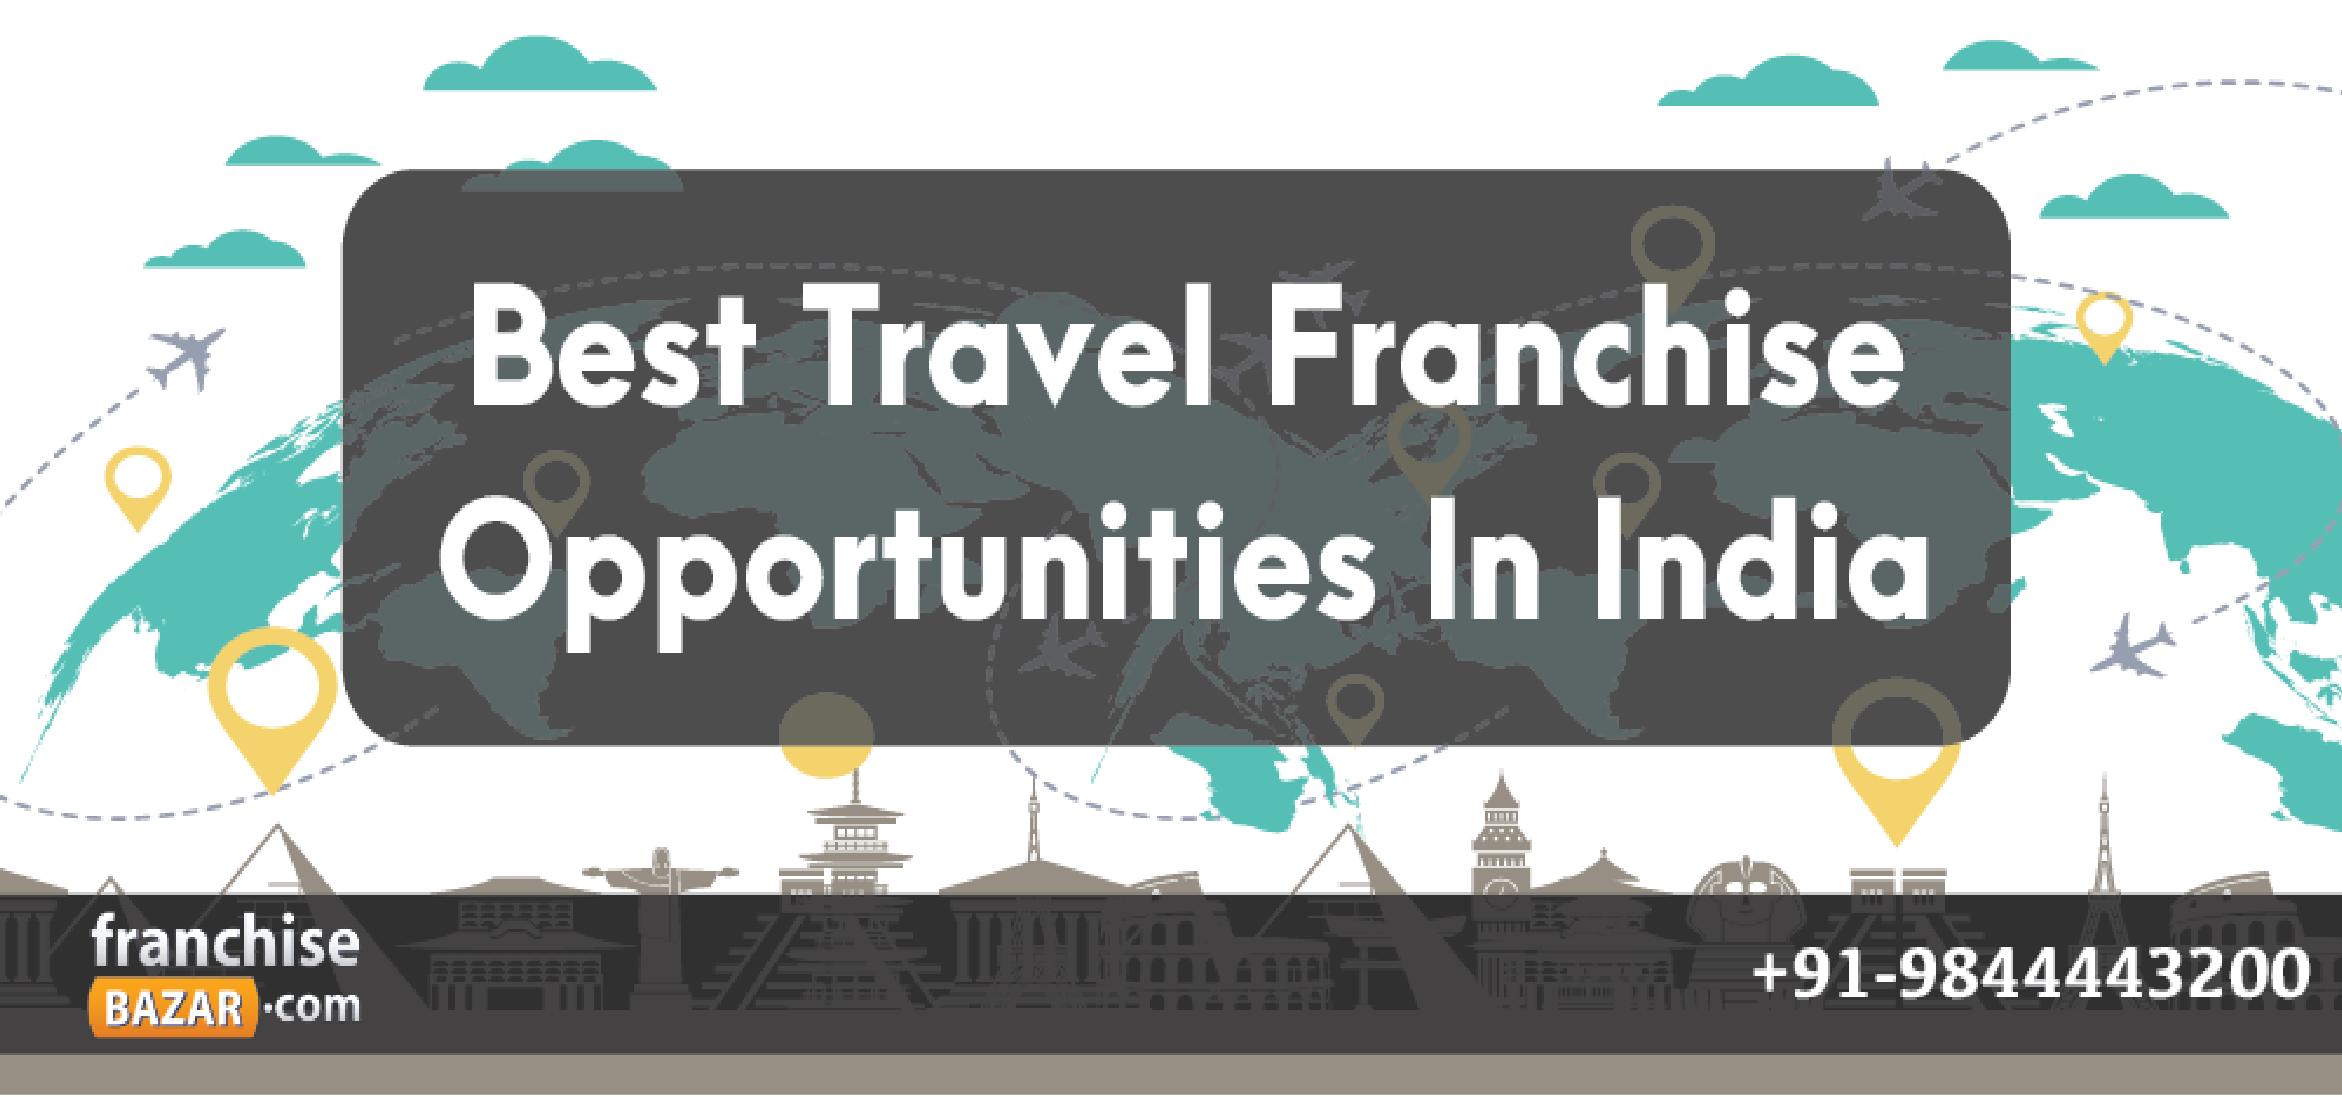 Best Travel Franchise Opportunities